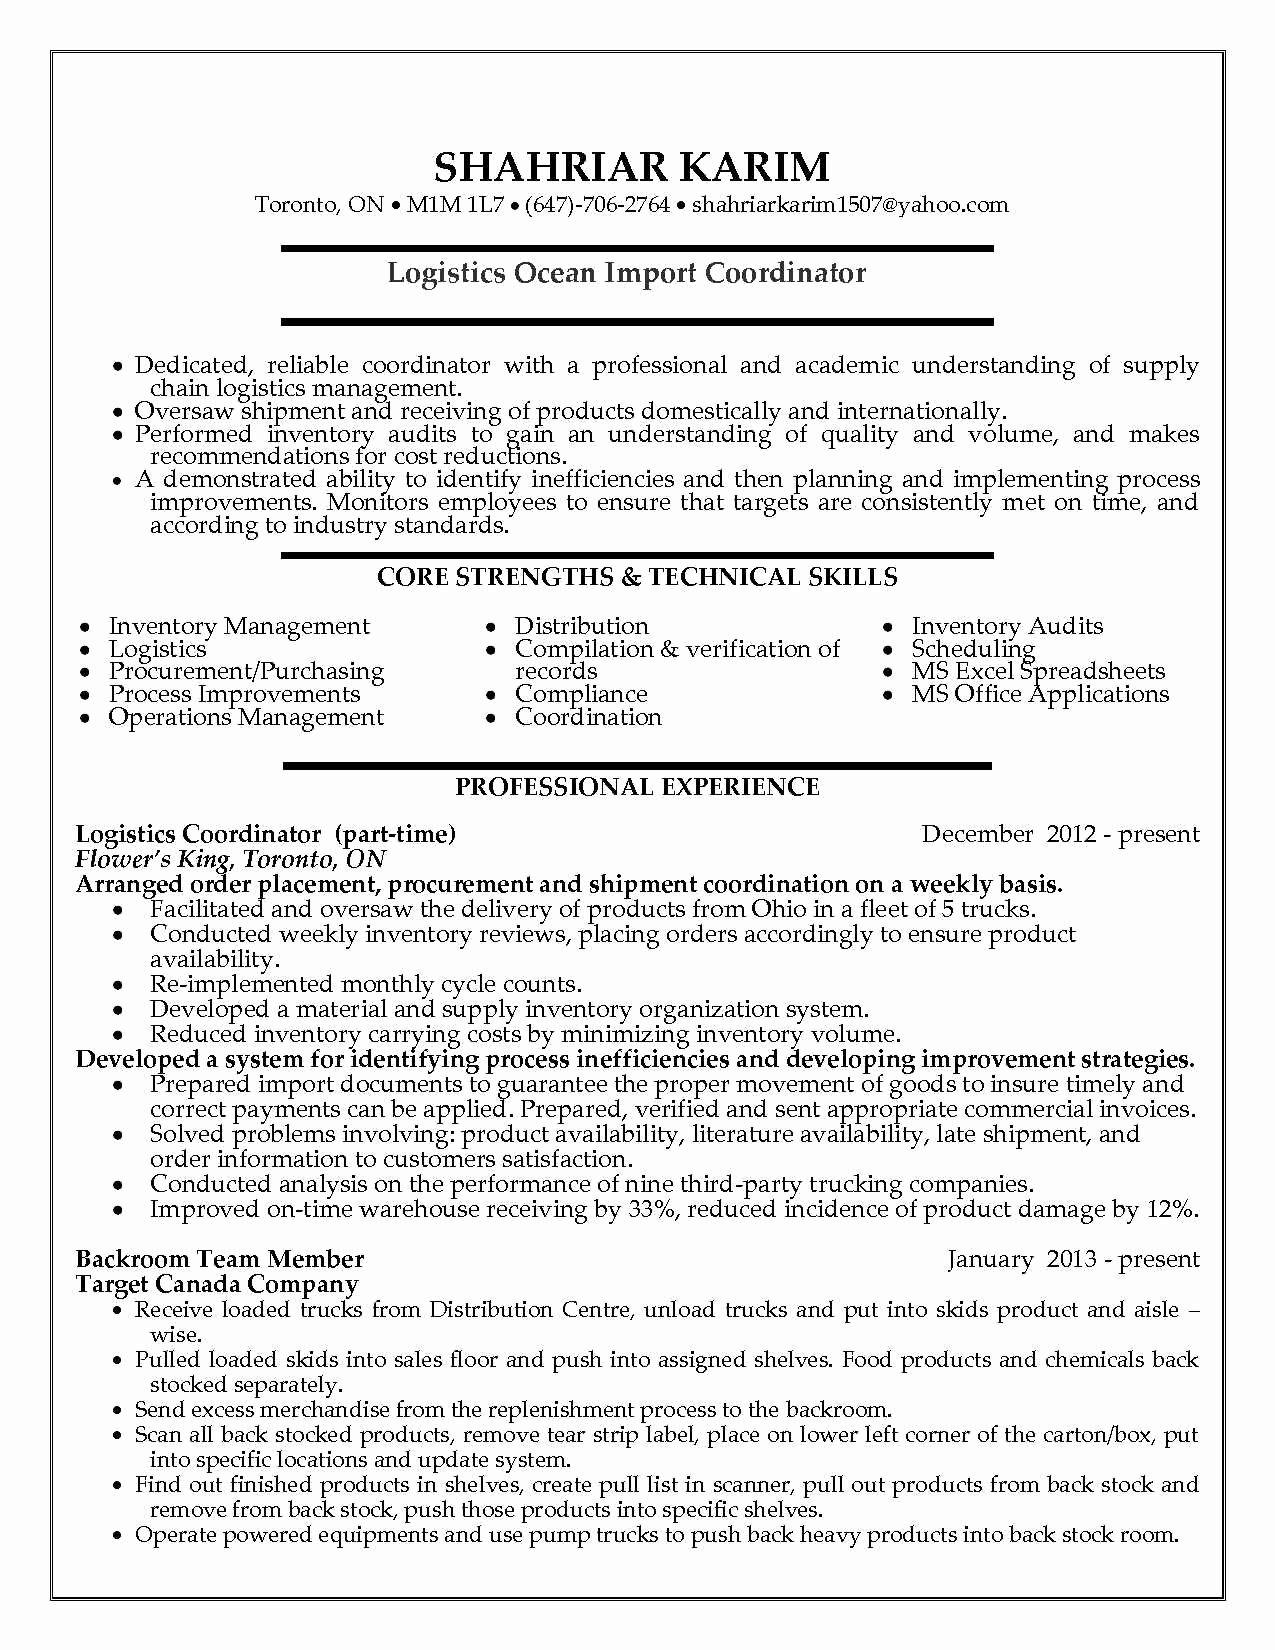 Logistic Coordinator Resume Sample Logistic Coordinator Resume Sample Logis Organizational Development Consultant Logistics Management Project Manager Resume